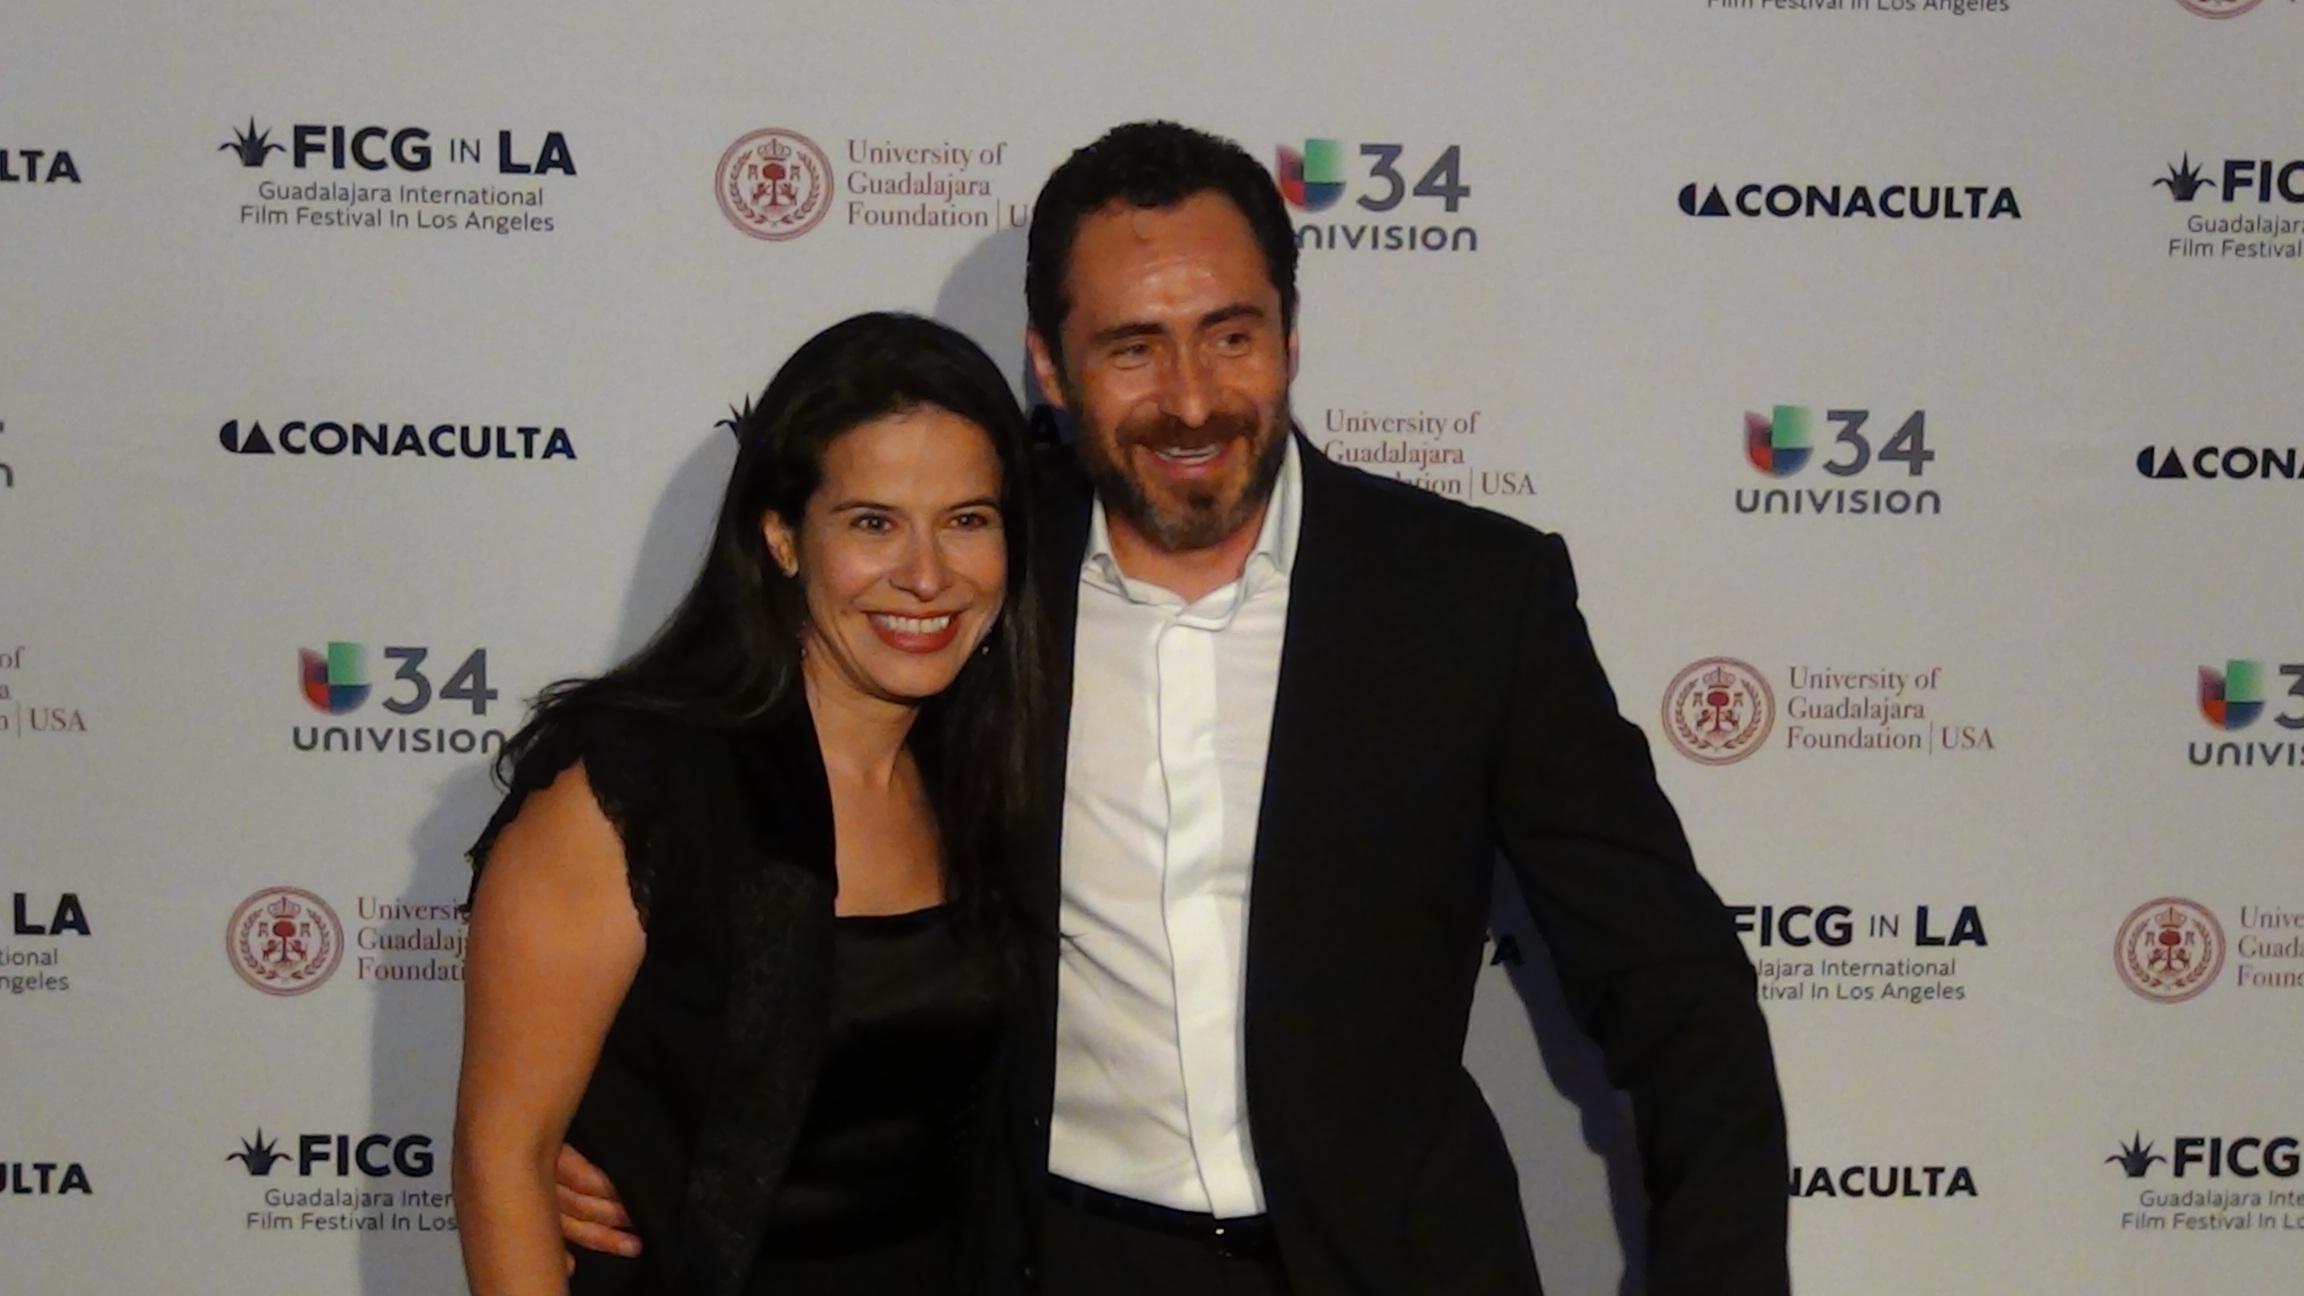 Arcelia Ramirez y Demian Bichir 6439.JPG